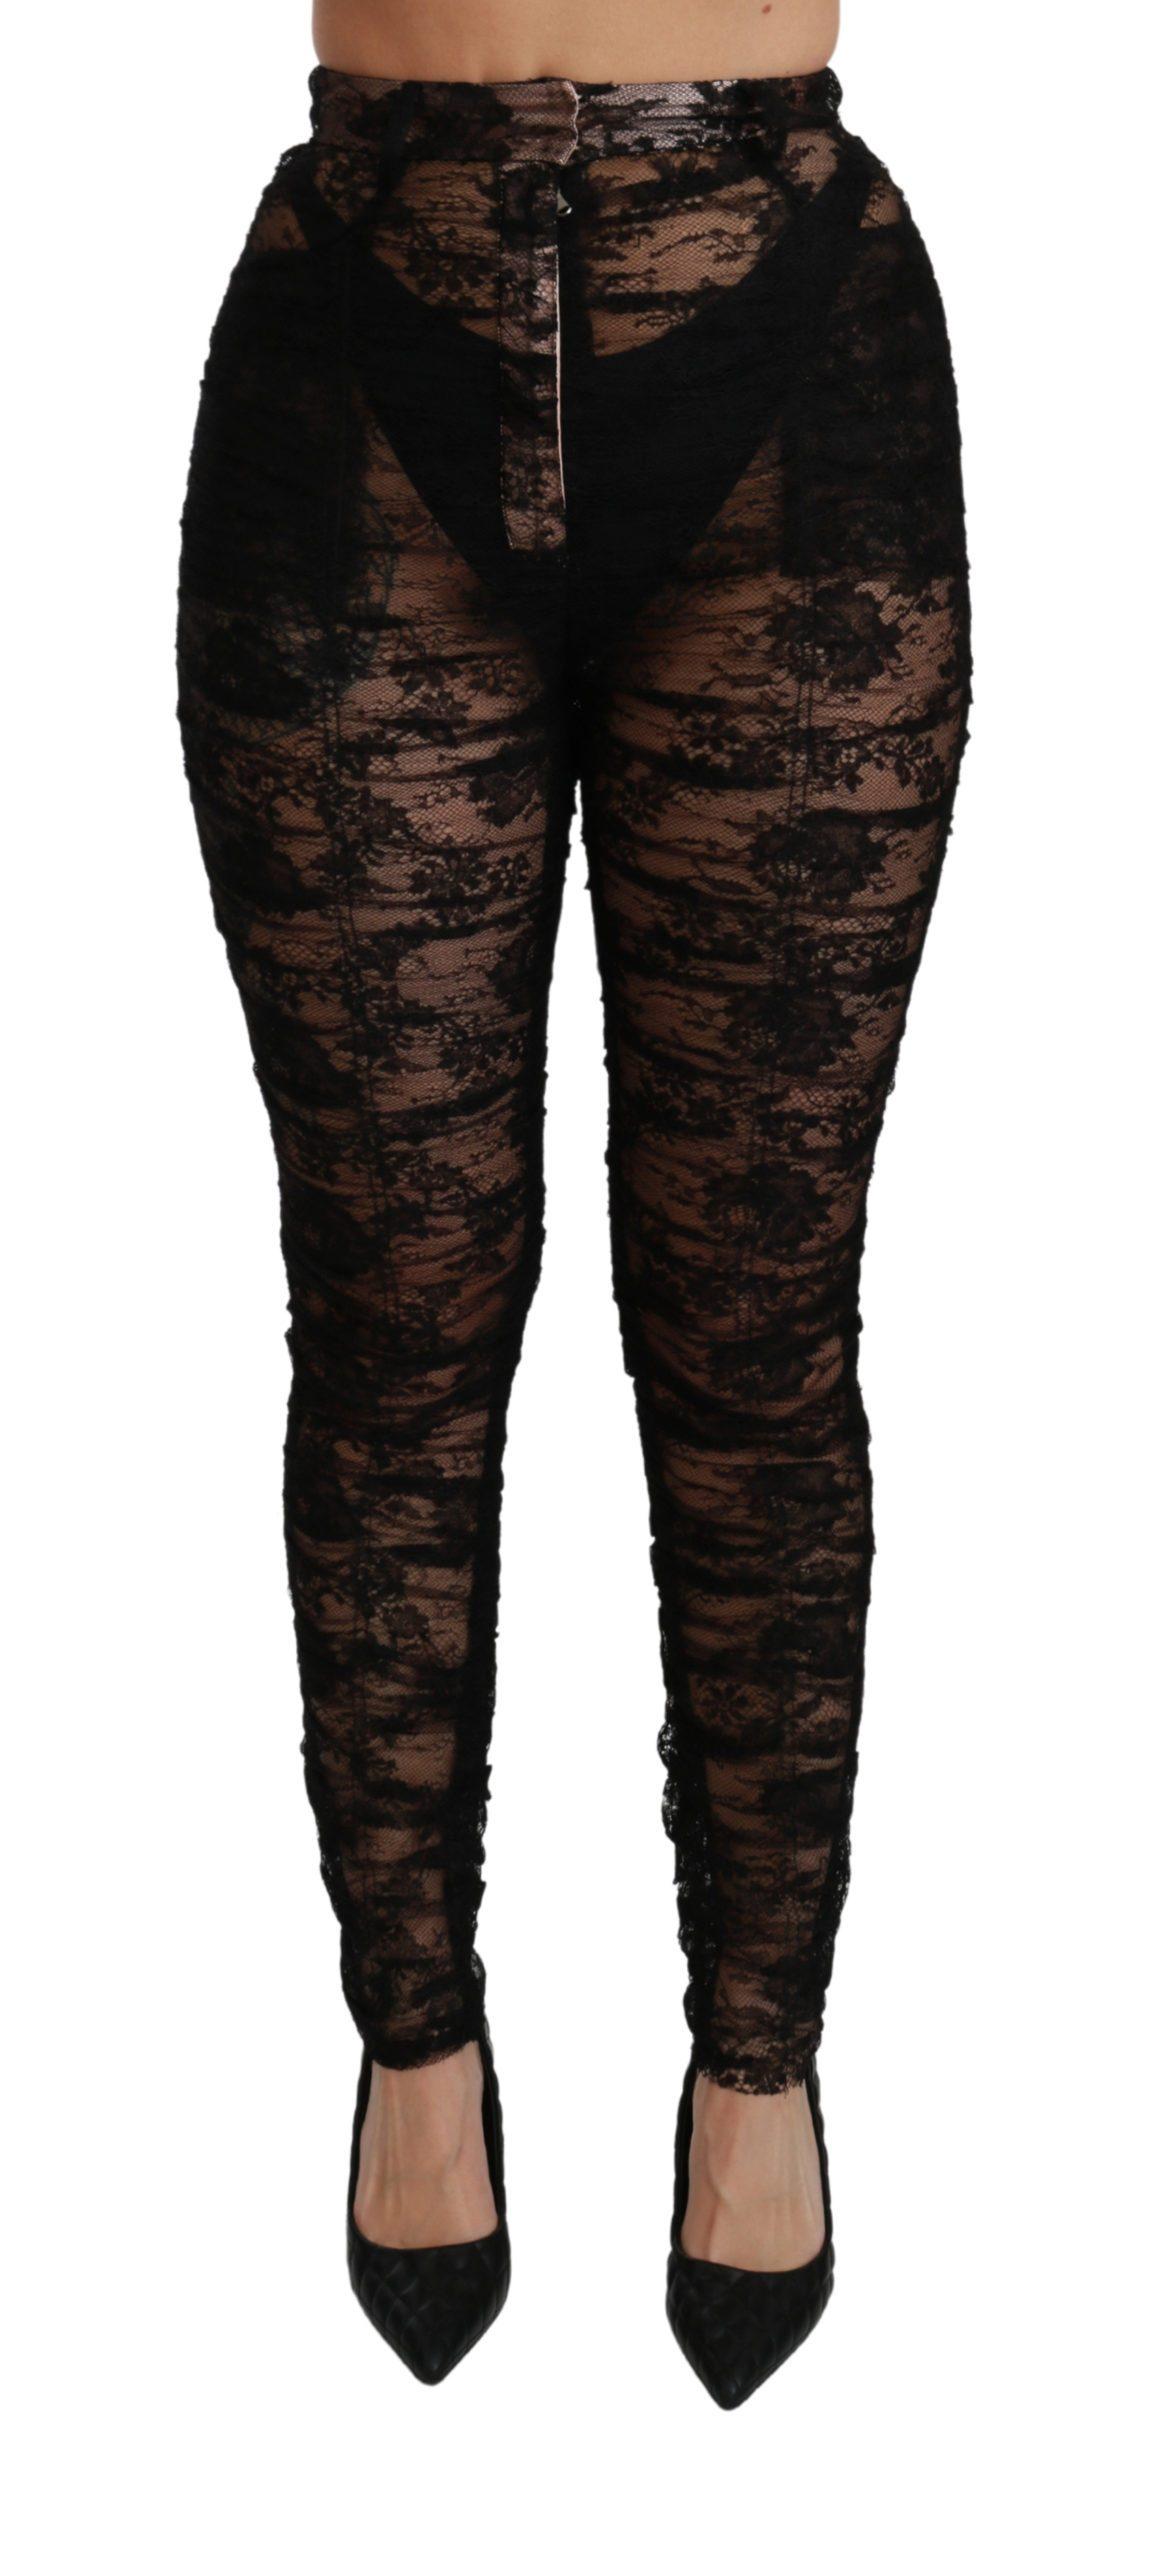 Black Lace High Waist Skinny Trouser Pants - IT40|S